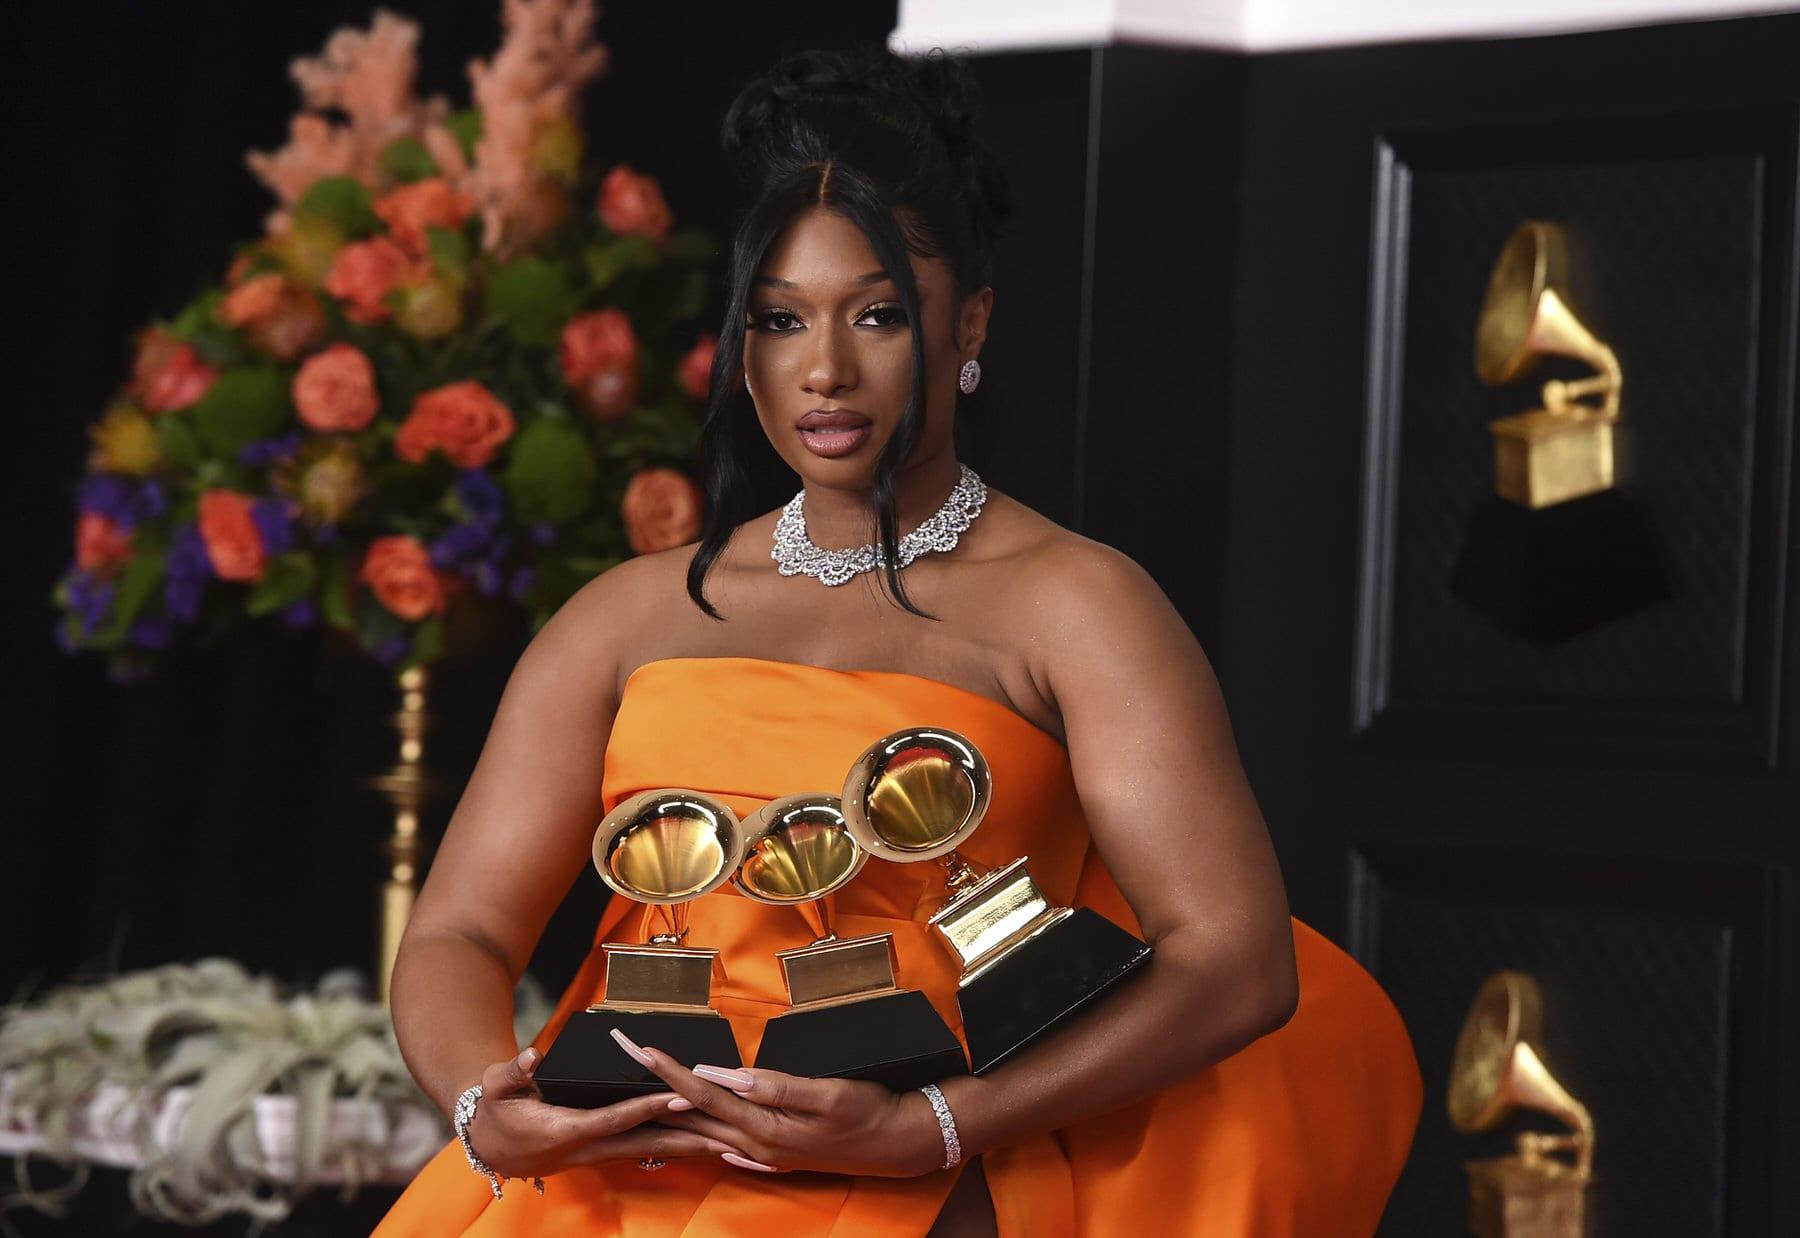 'WAP' and the politics of Black women's bodies